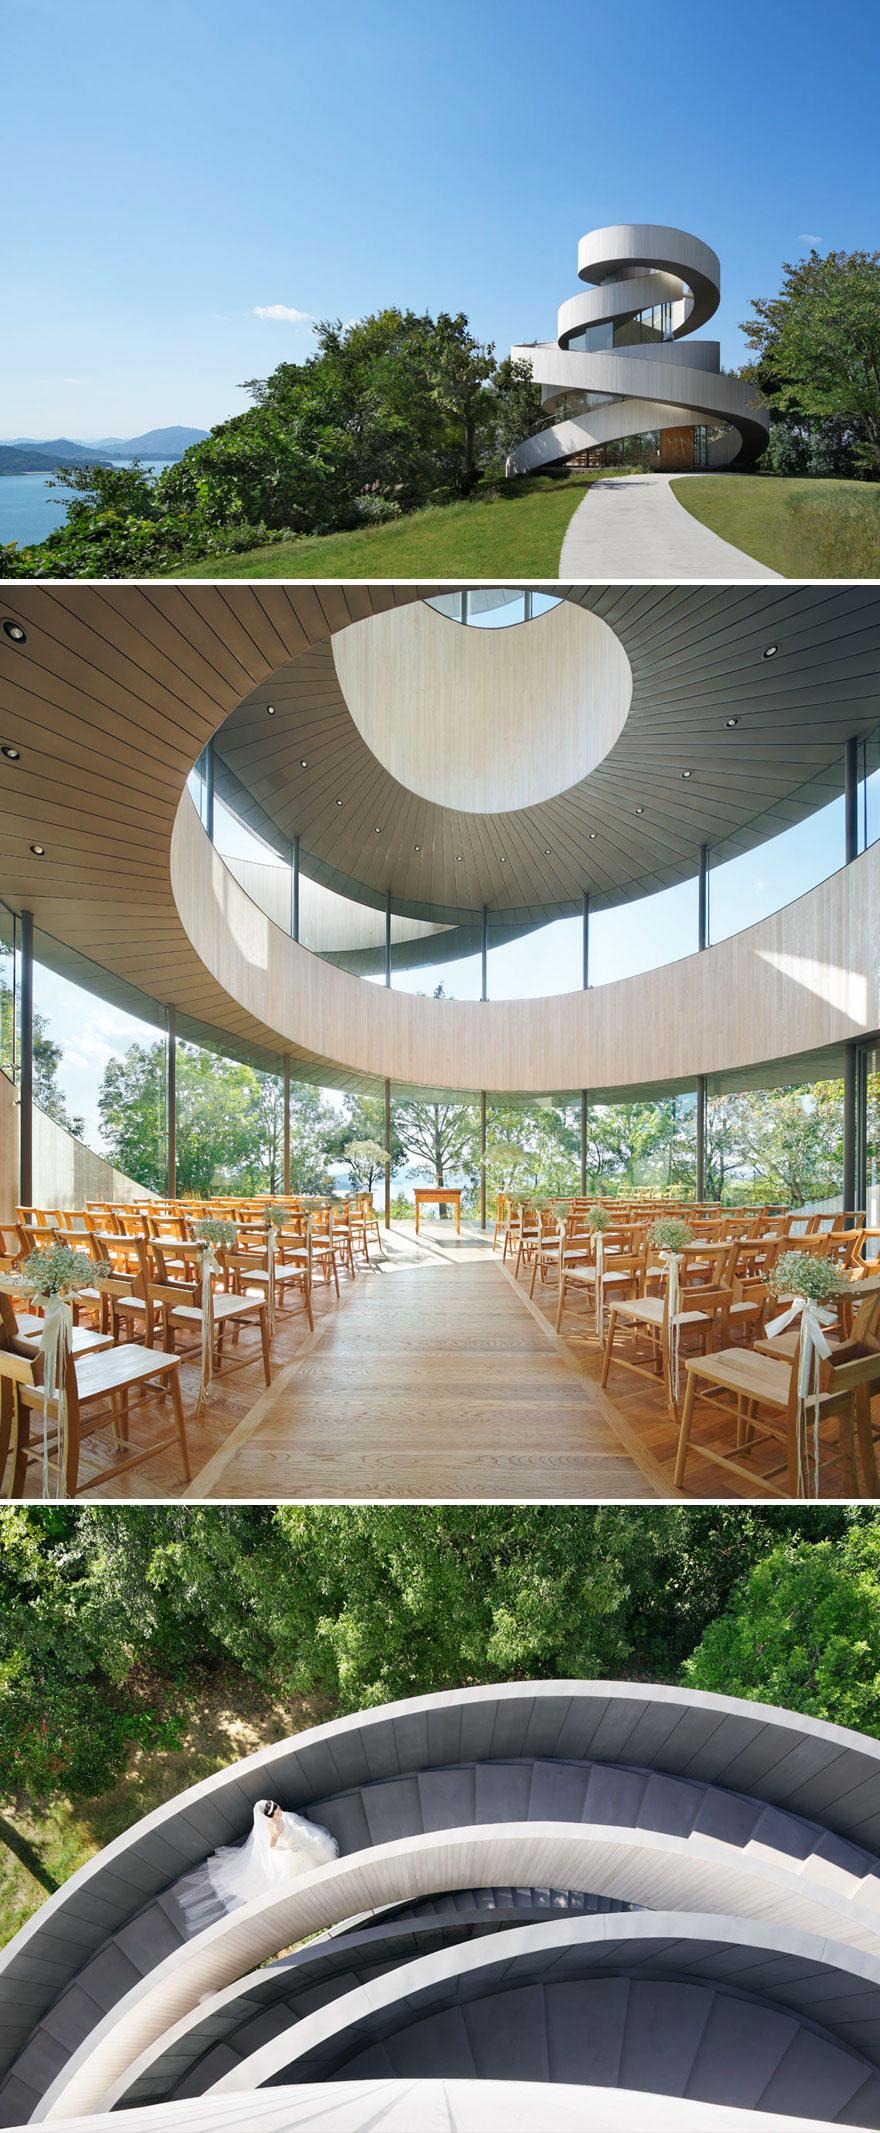 # 10 Chapelle du ruban à Hiroshima